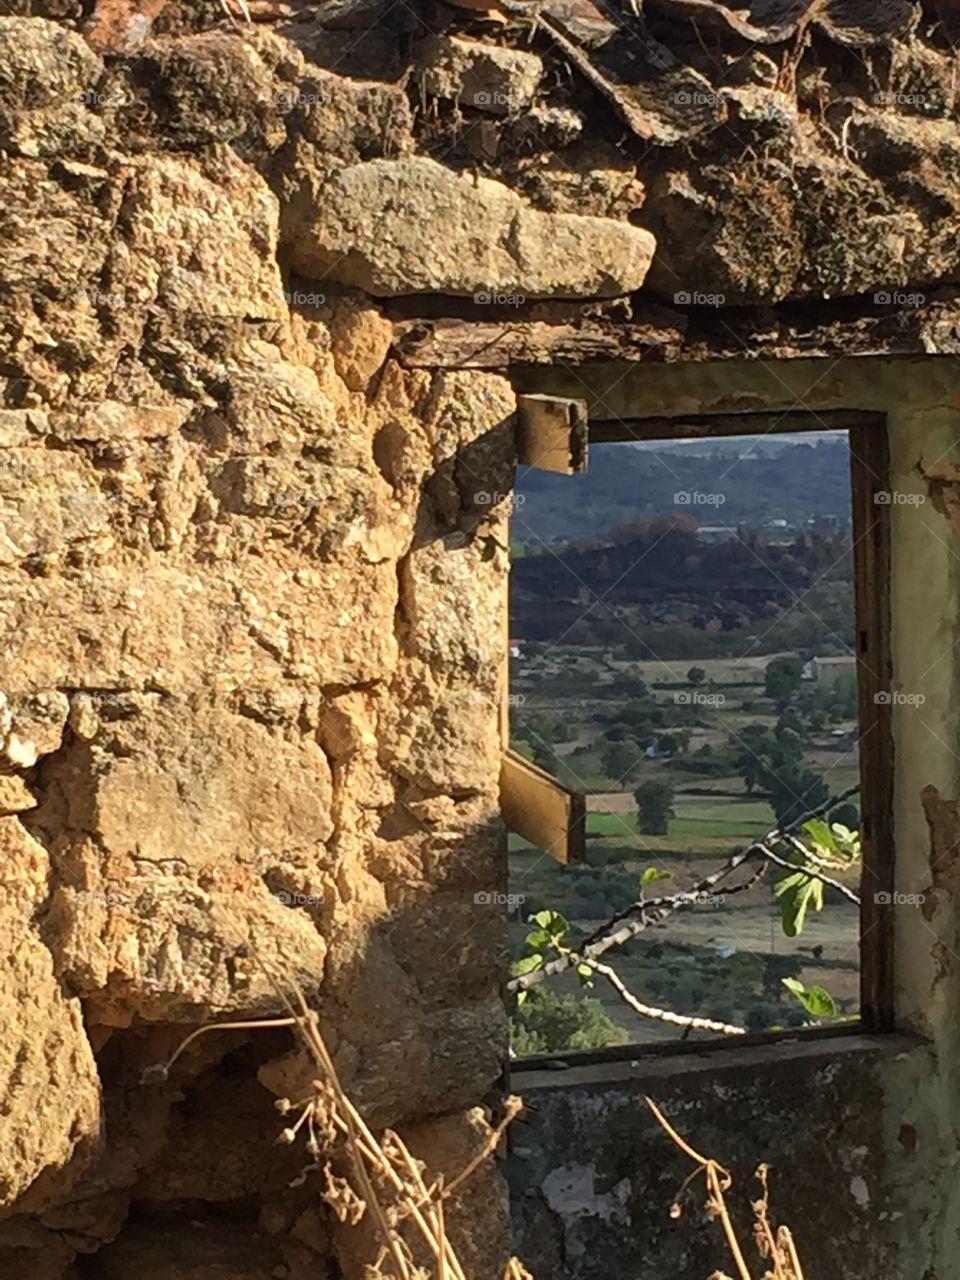 Belmonte view through old wall window